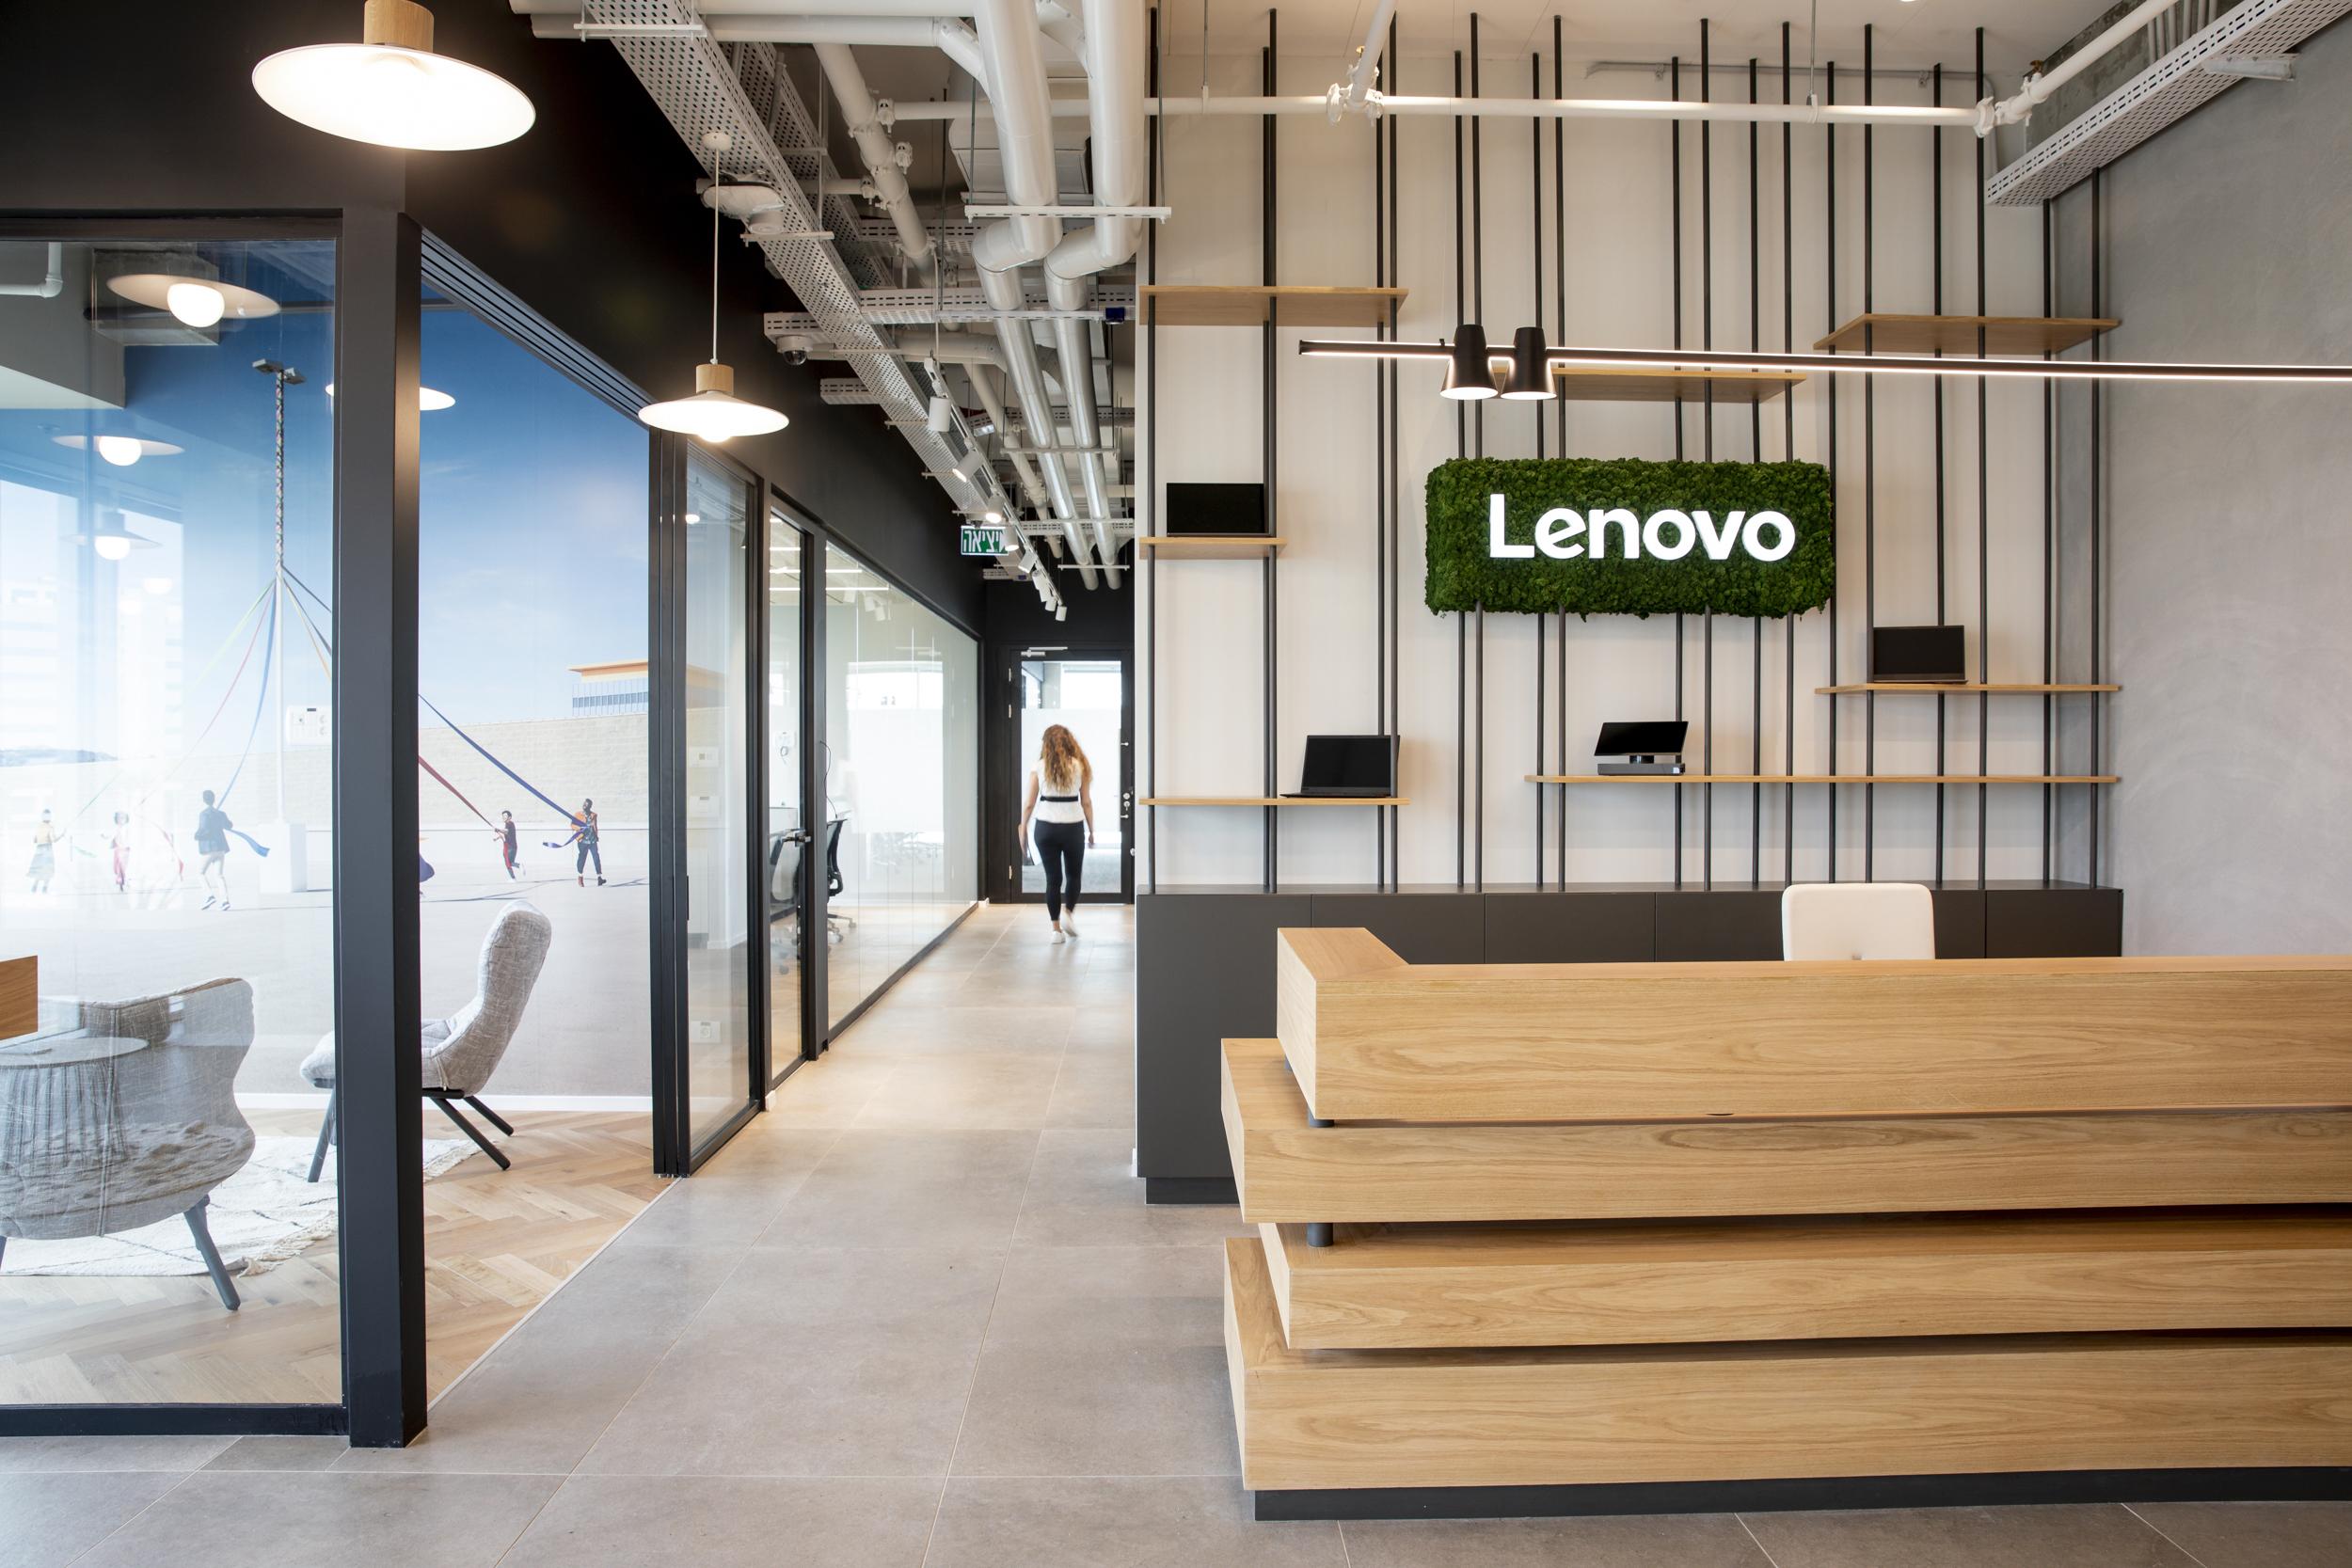 SZ Lenovo By Kfir Ziv_ (13)